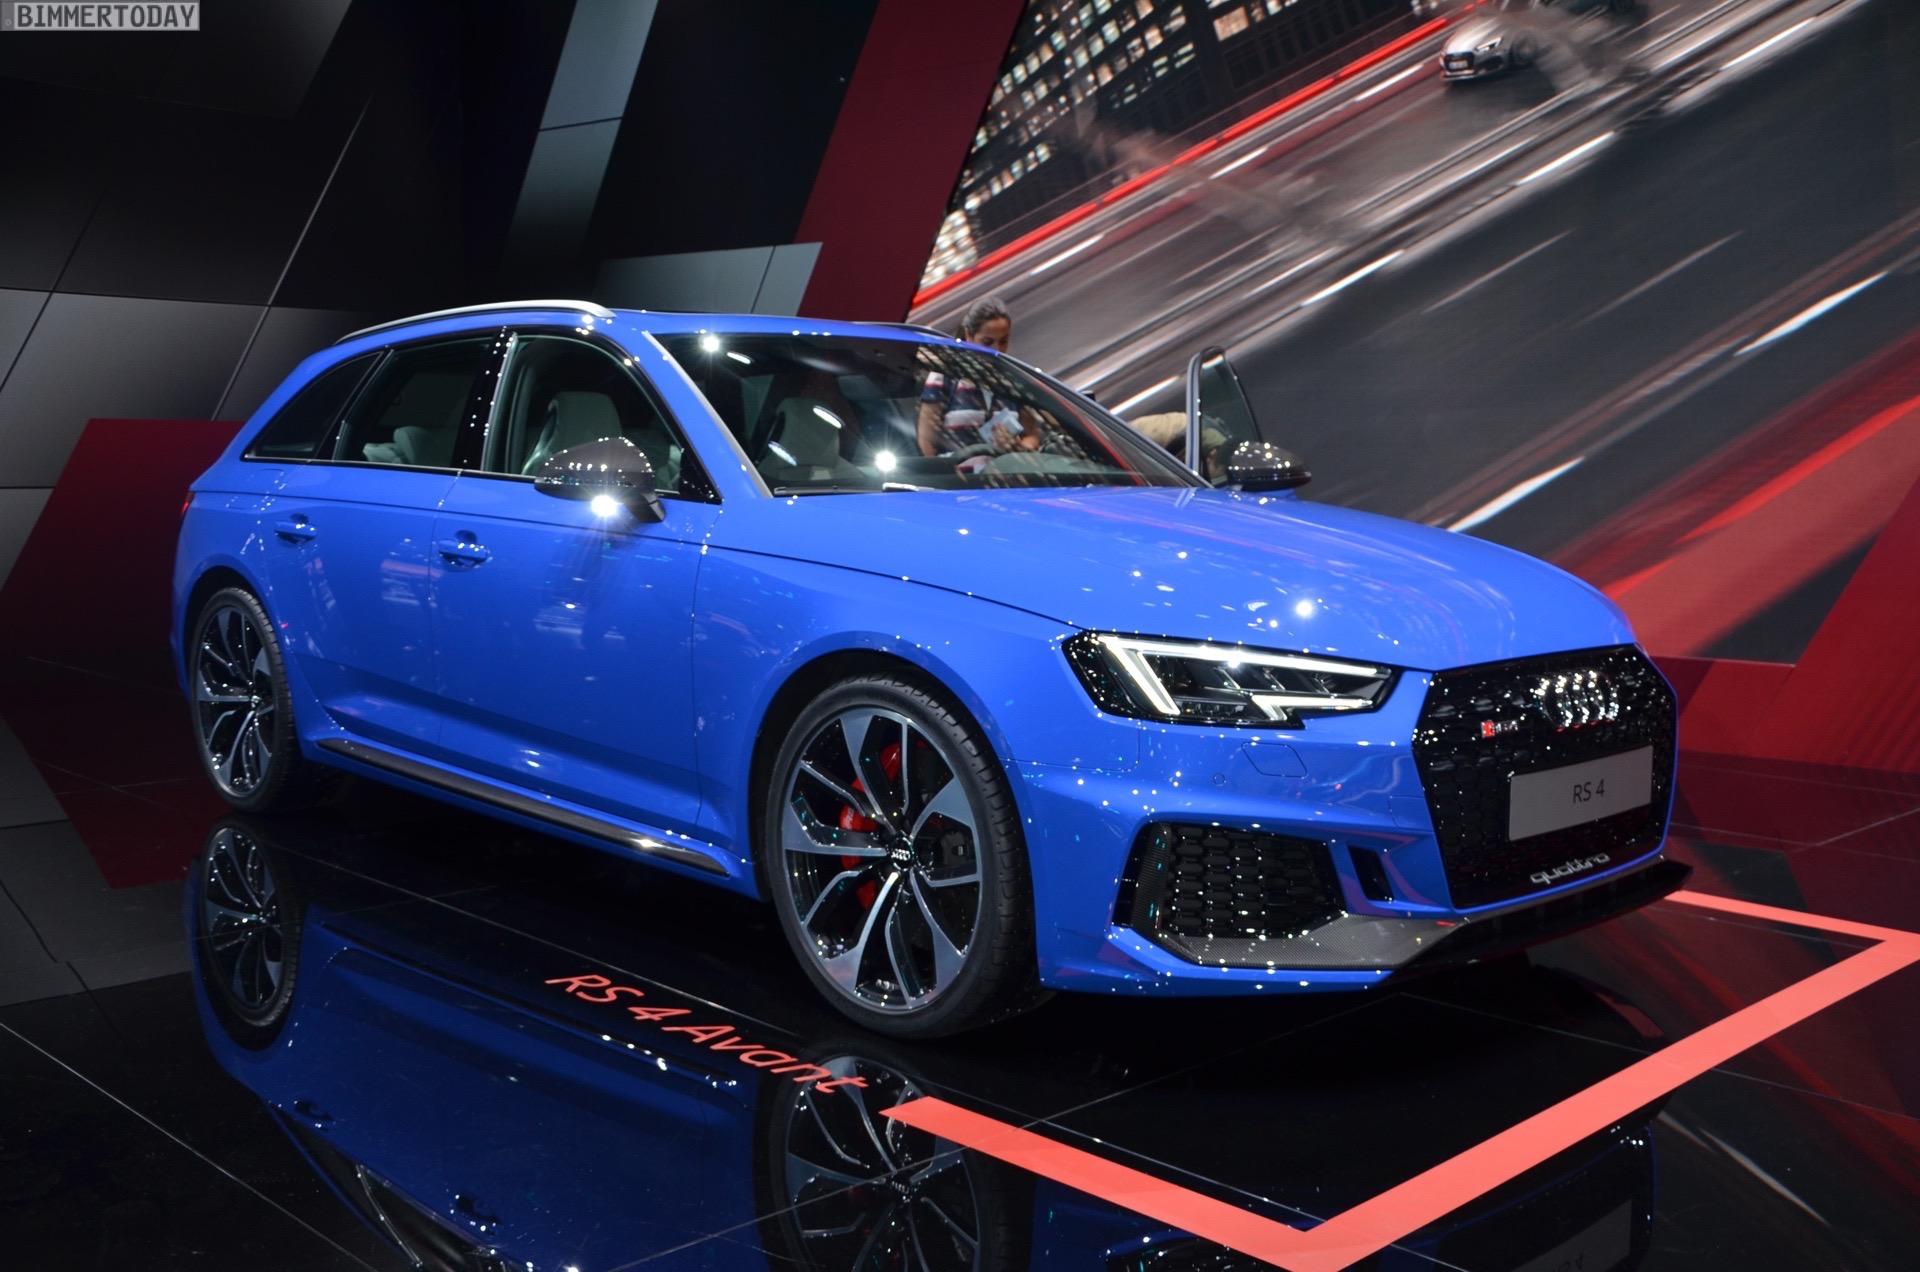 Iaa 2017 Weltpremiere Des Audi Rs 4 Avant Mit V6 Biturbo